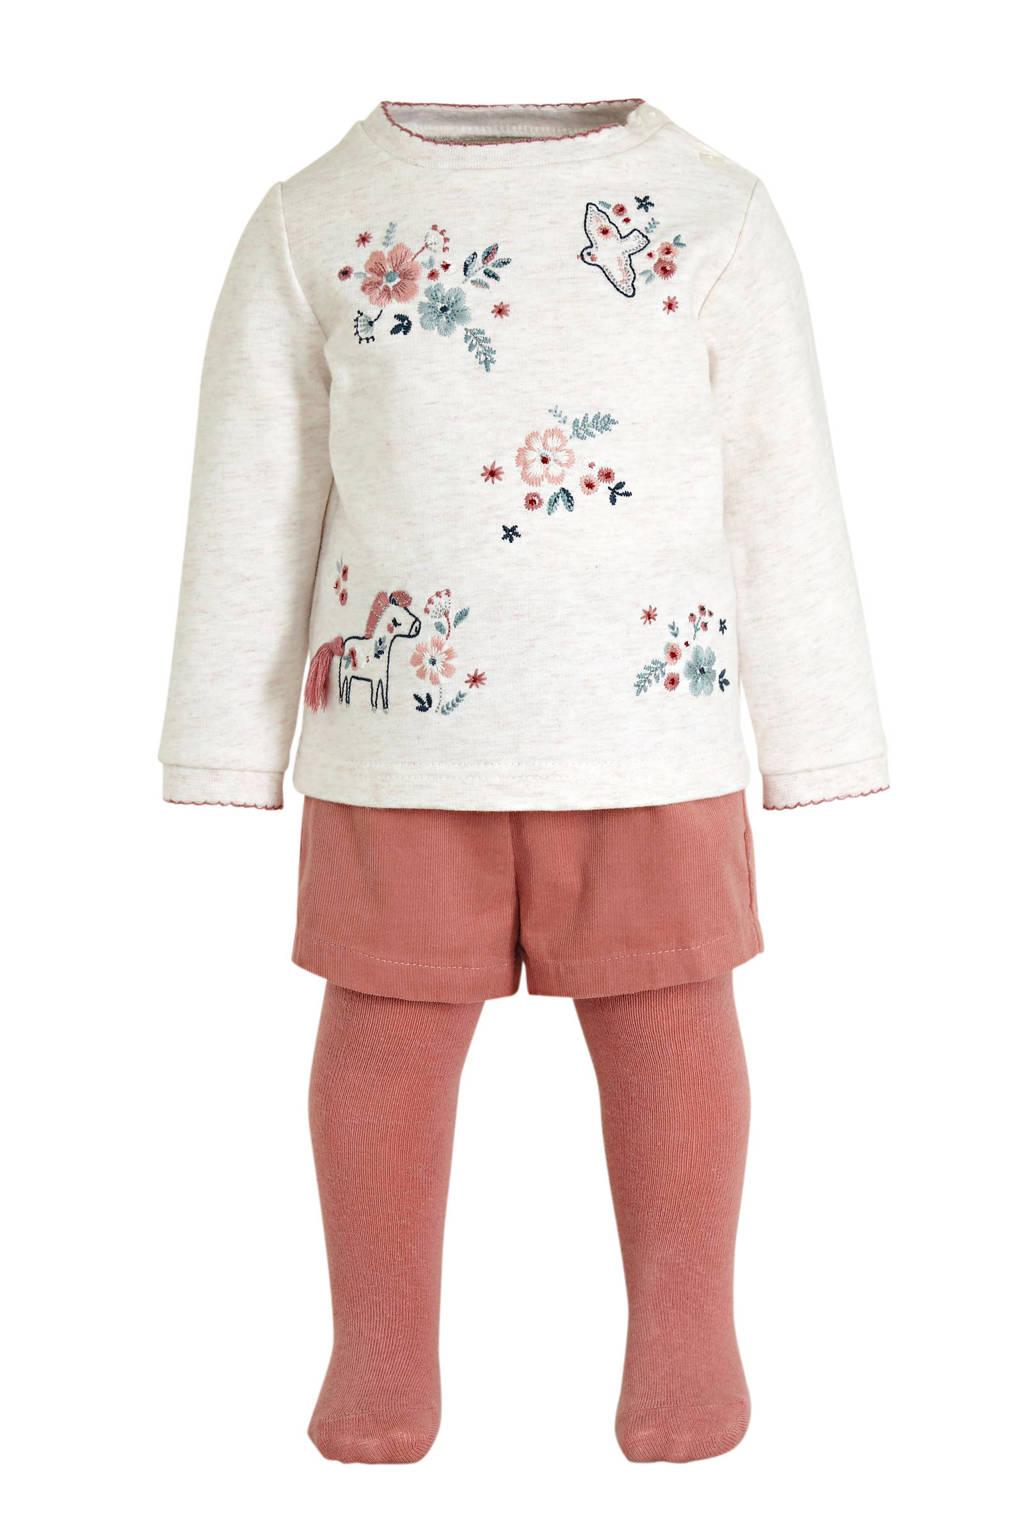 C&A Baby Club sweater + short + maillot ecru/oudroze, Ecru/oudroze